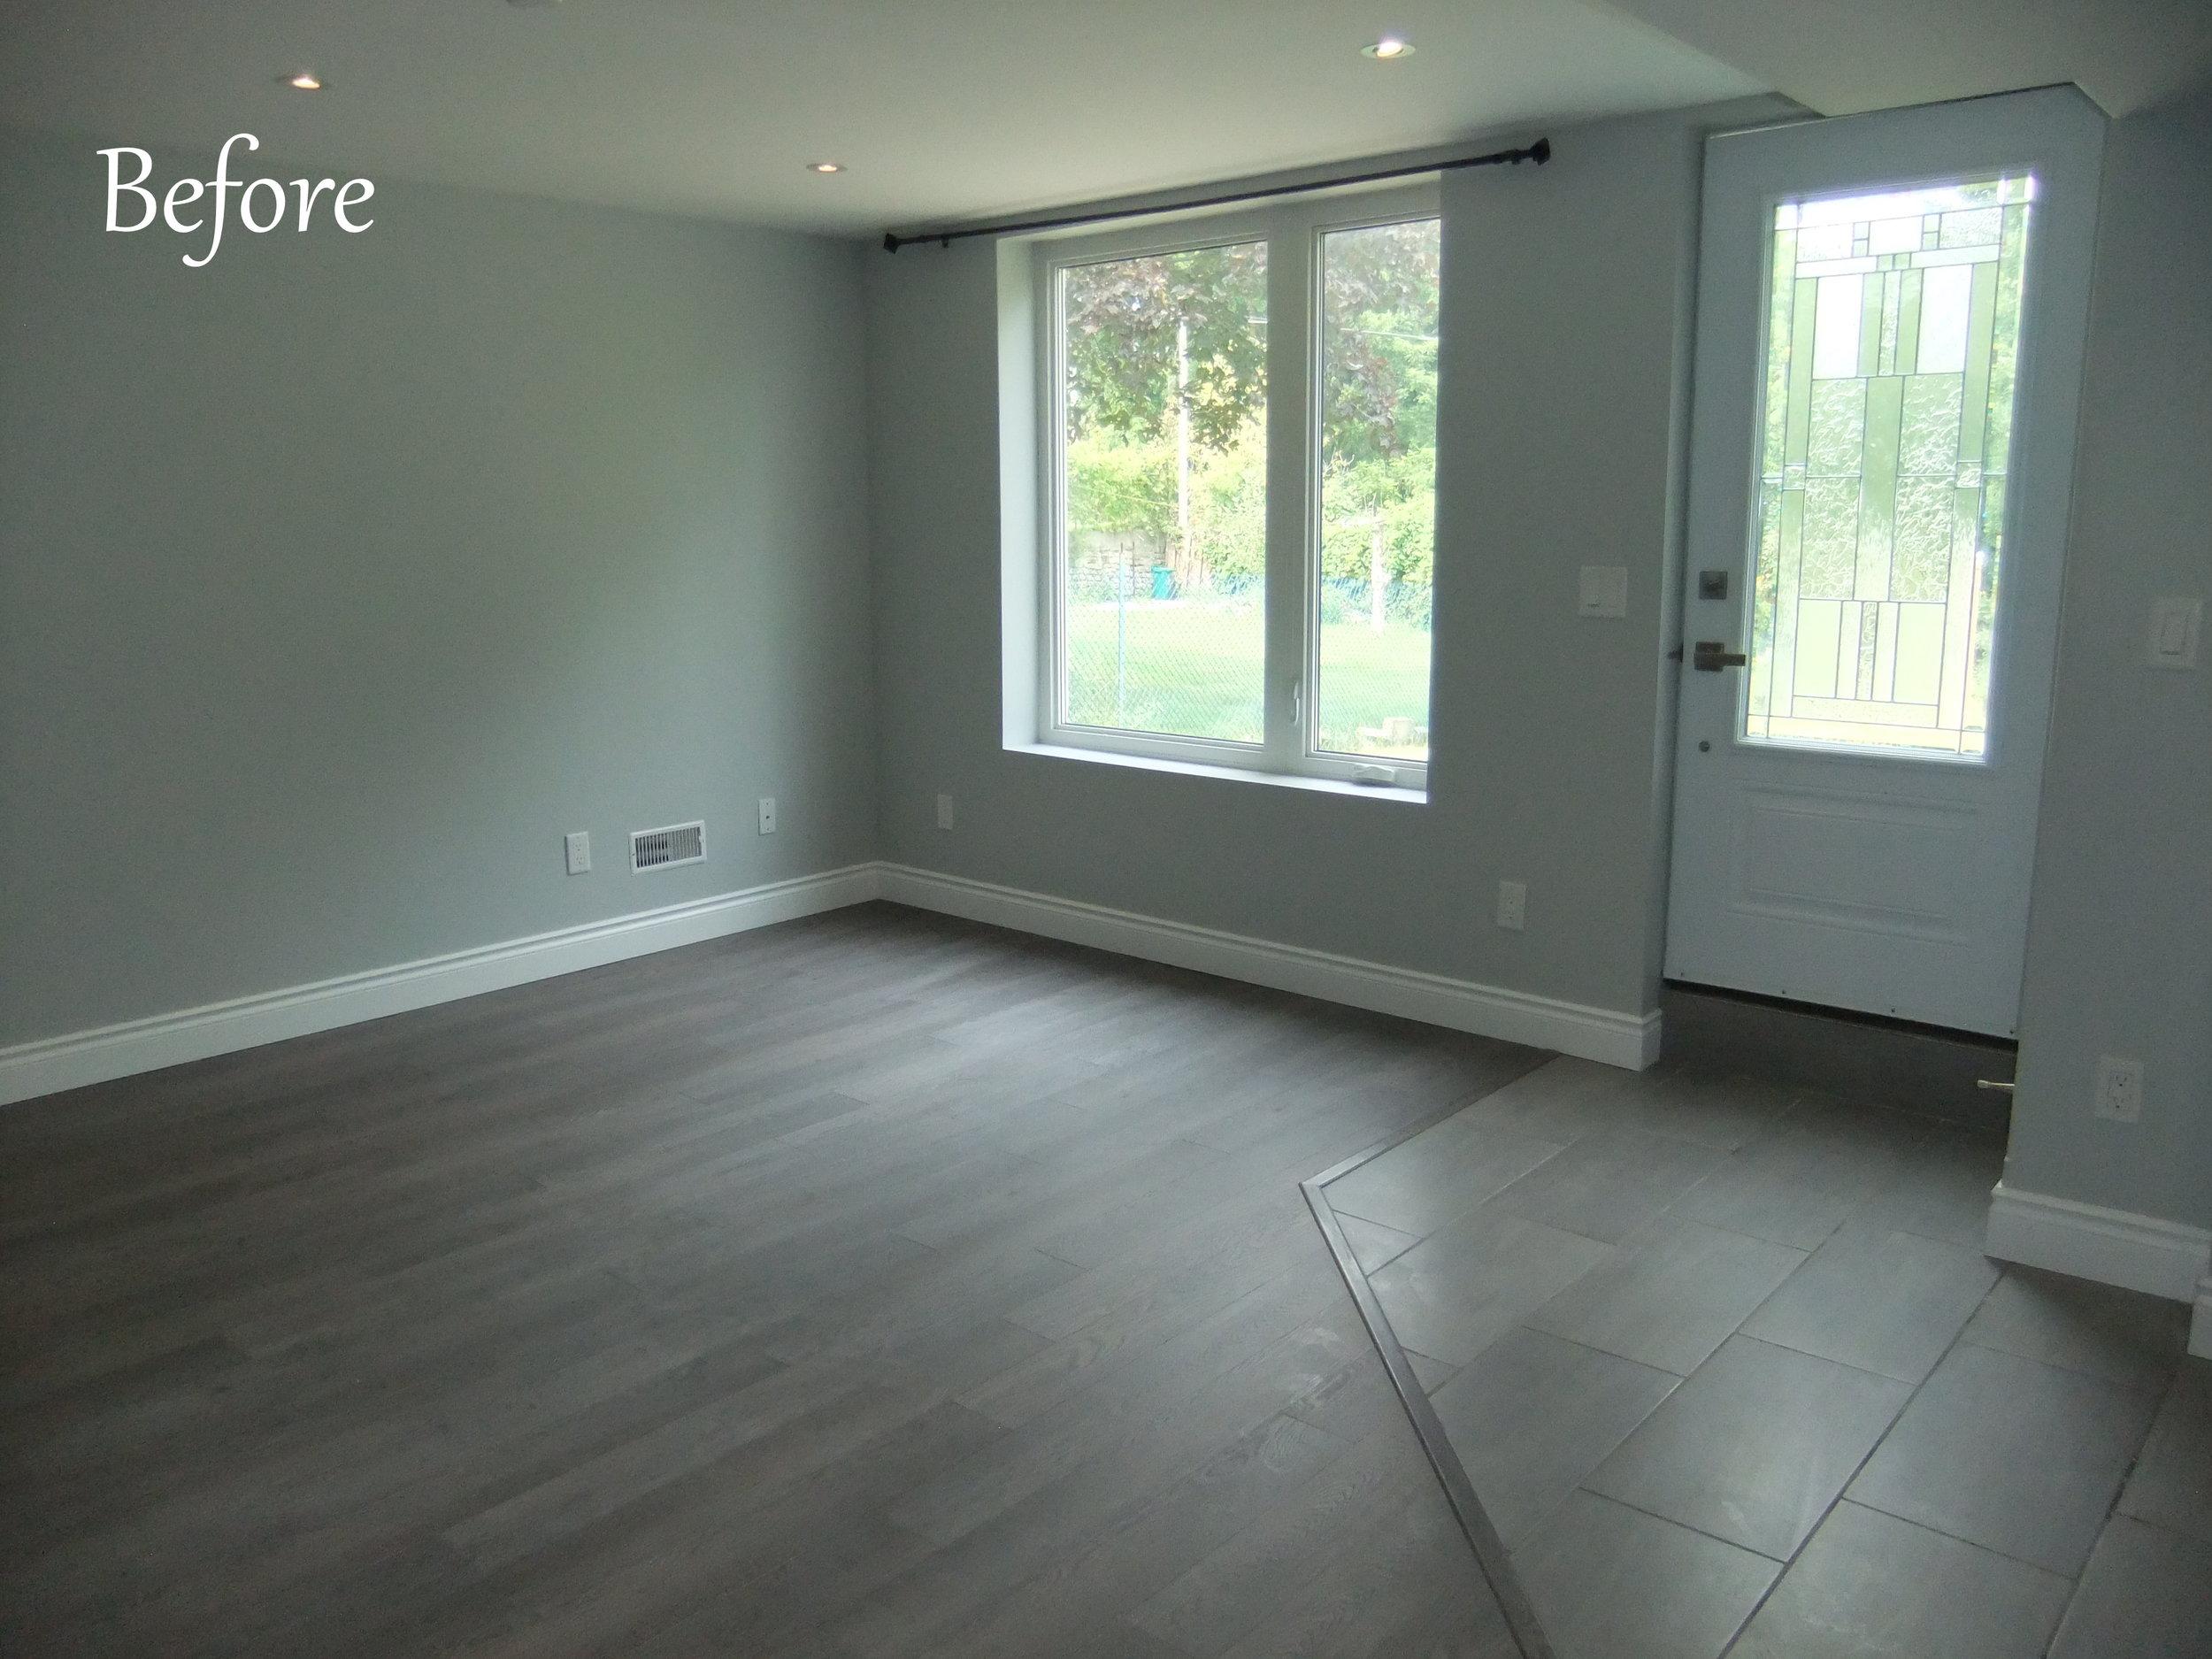 Livingroom 3 - Before.jpg